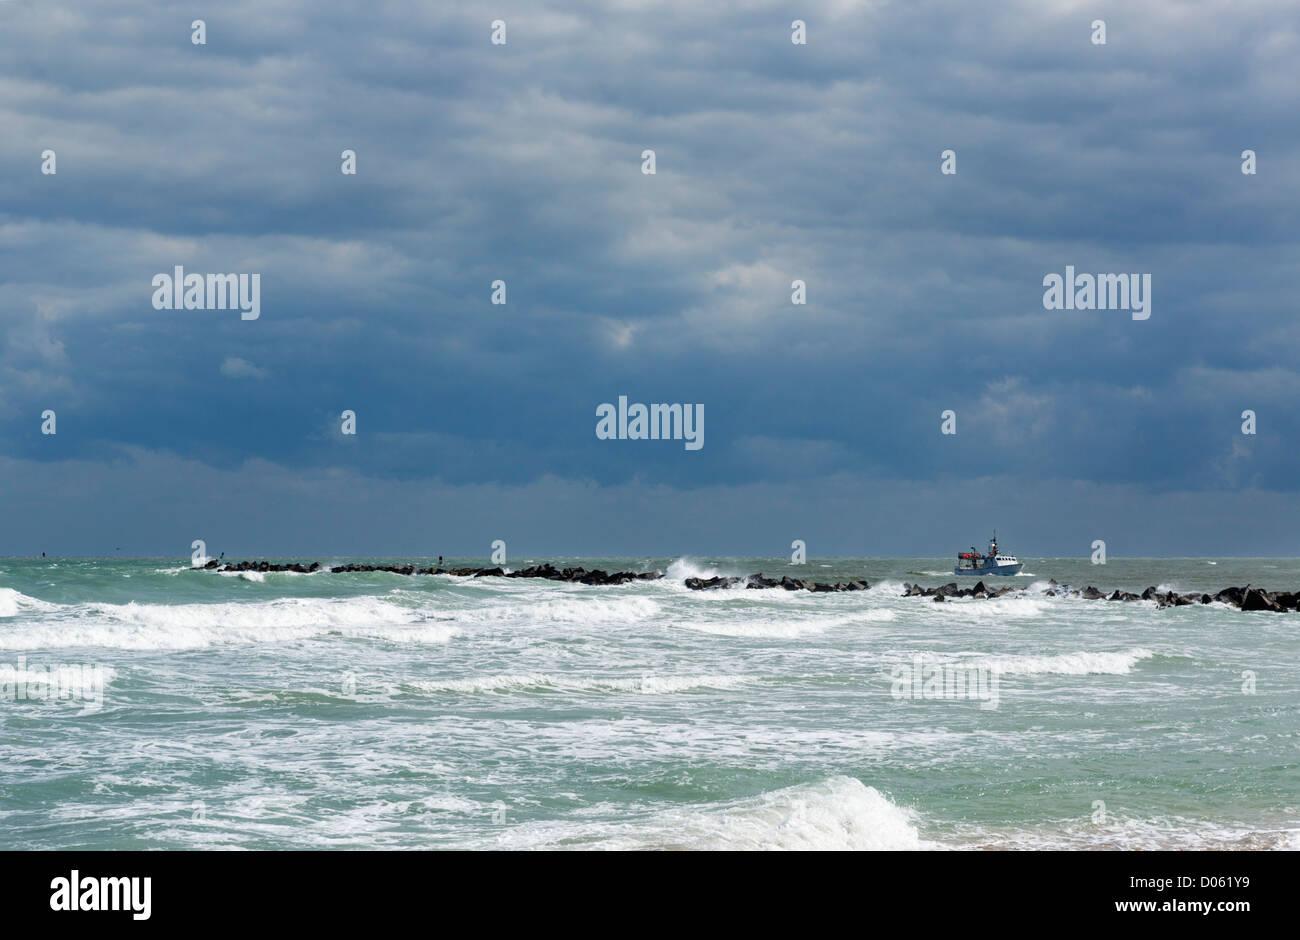 File:Fort Pierce Inlet Fort Pierce Florida photo D Ramey